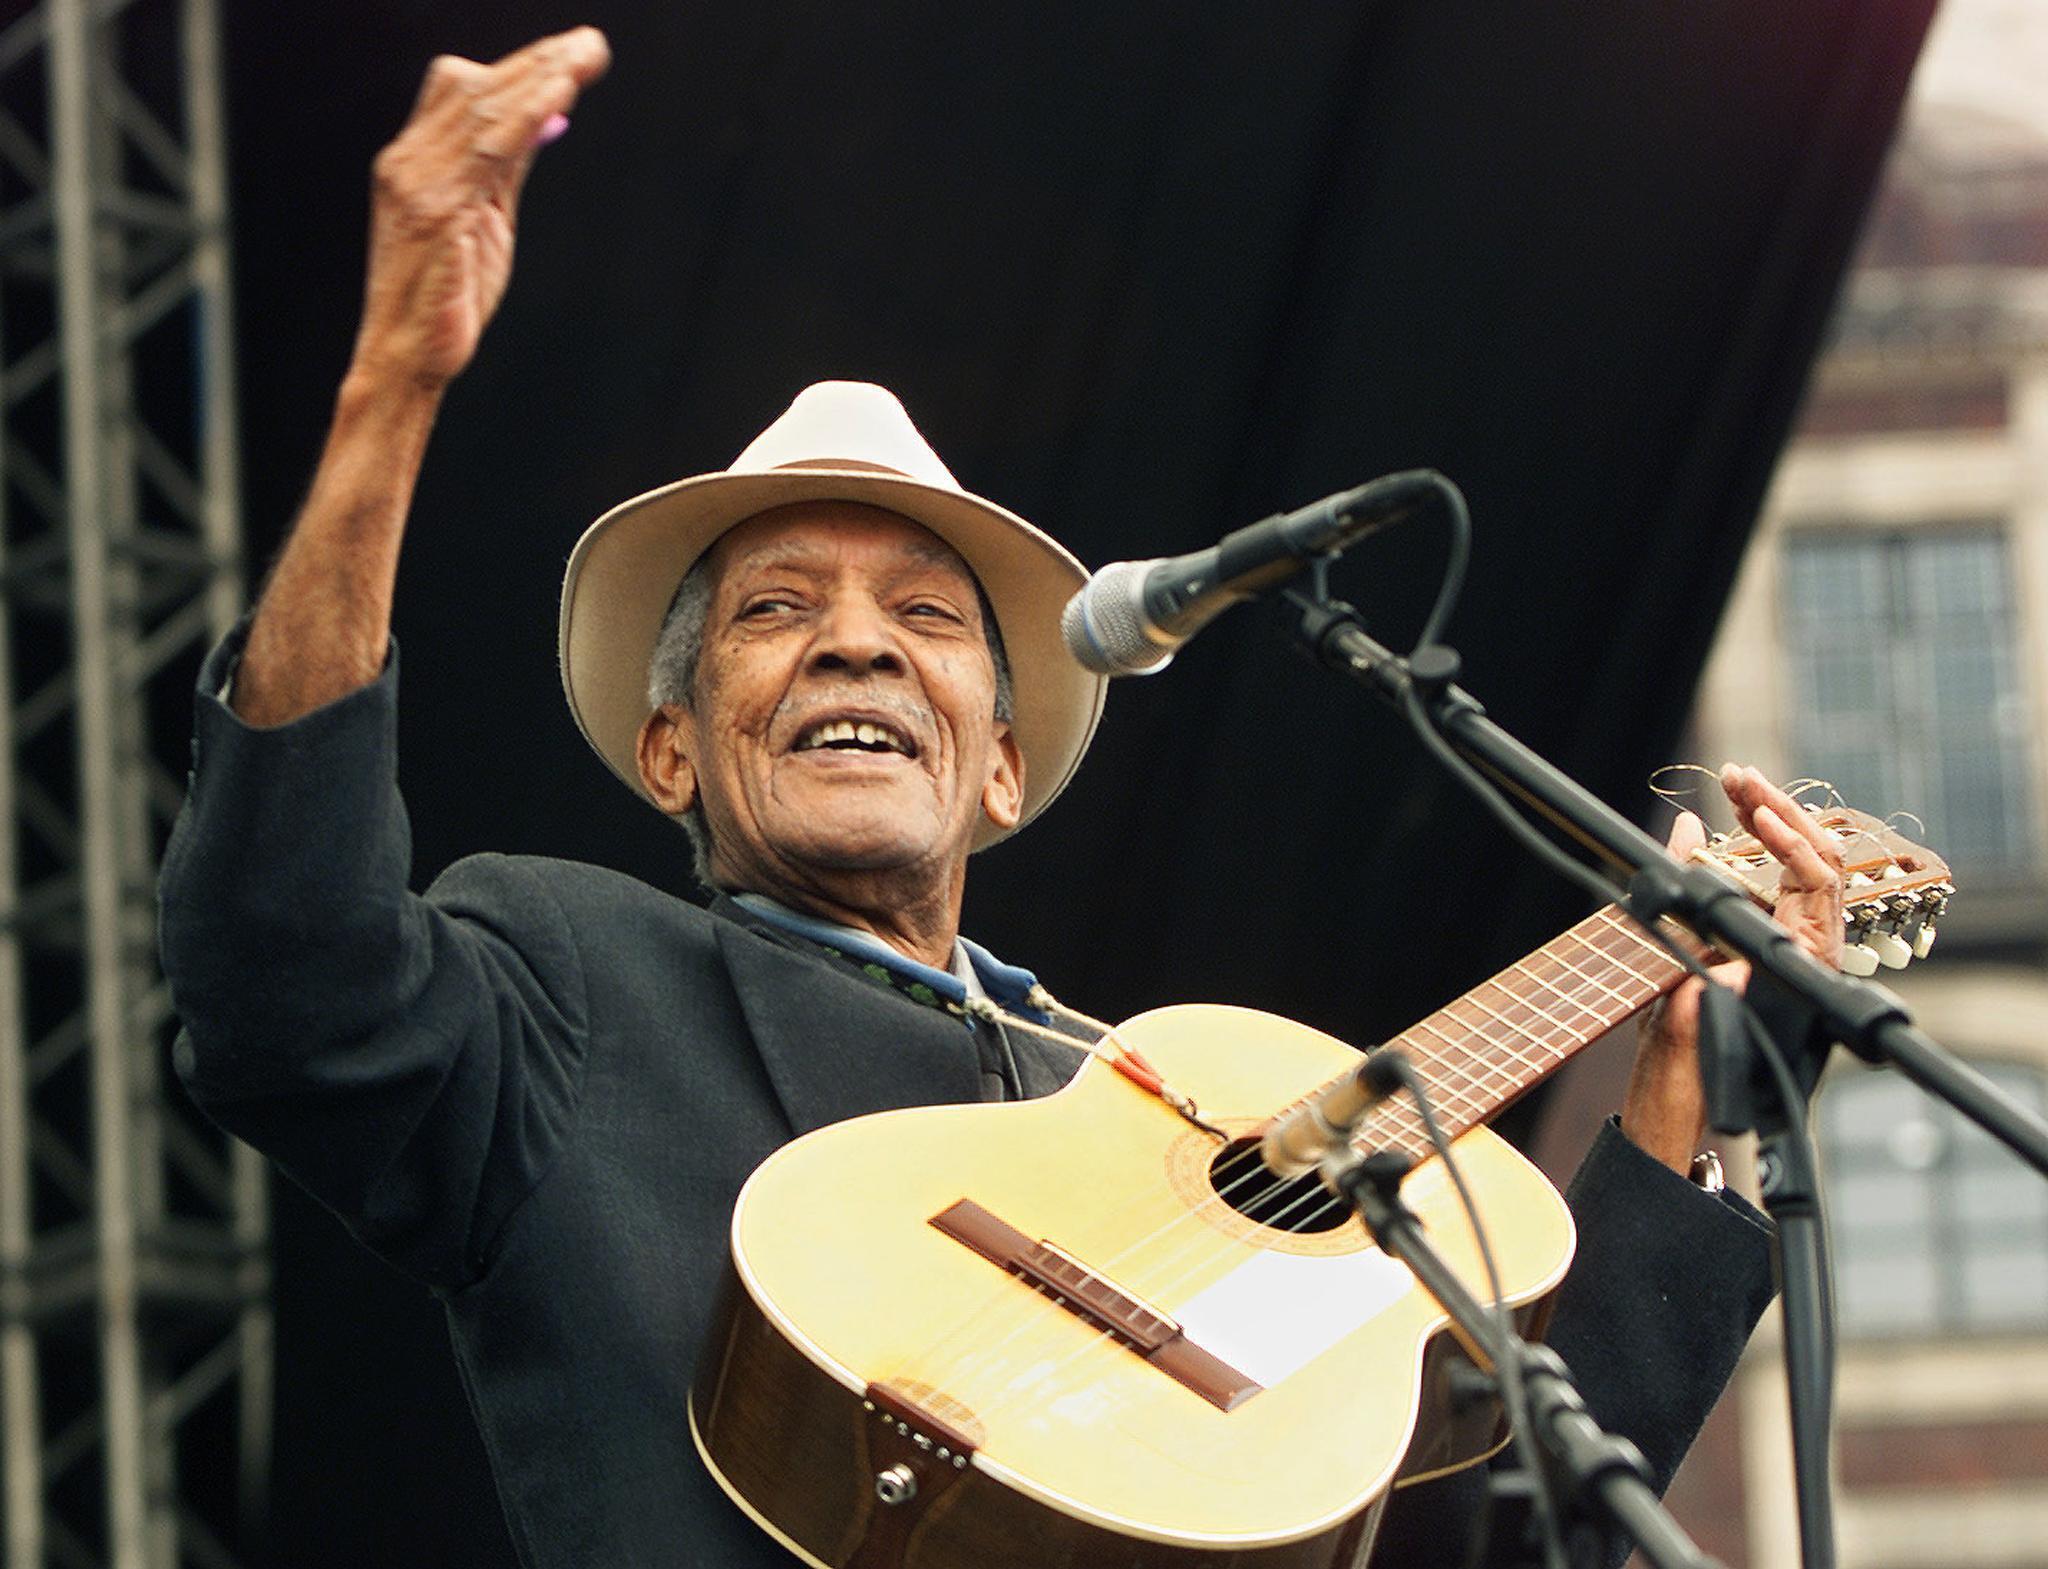 Une photo de 2001 de Compay Segundo, l'un des artistes les plus célèbres de Cuba, mort en 2003.